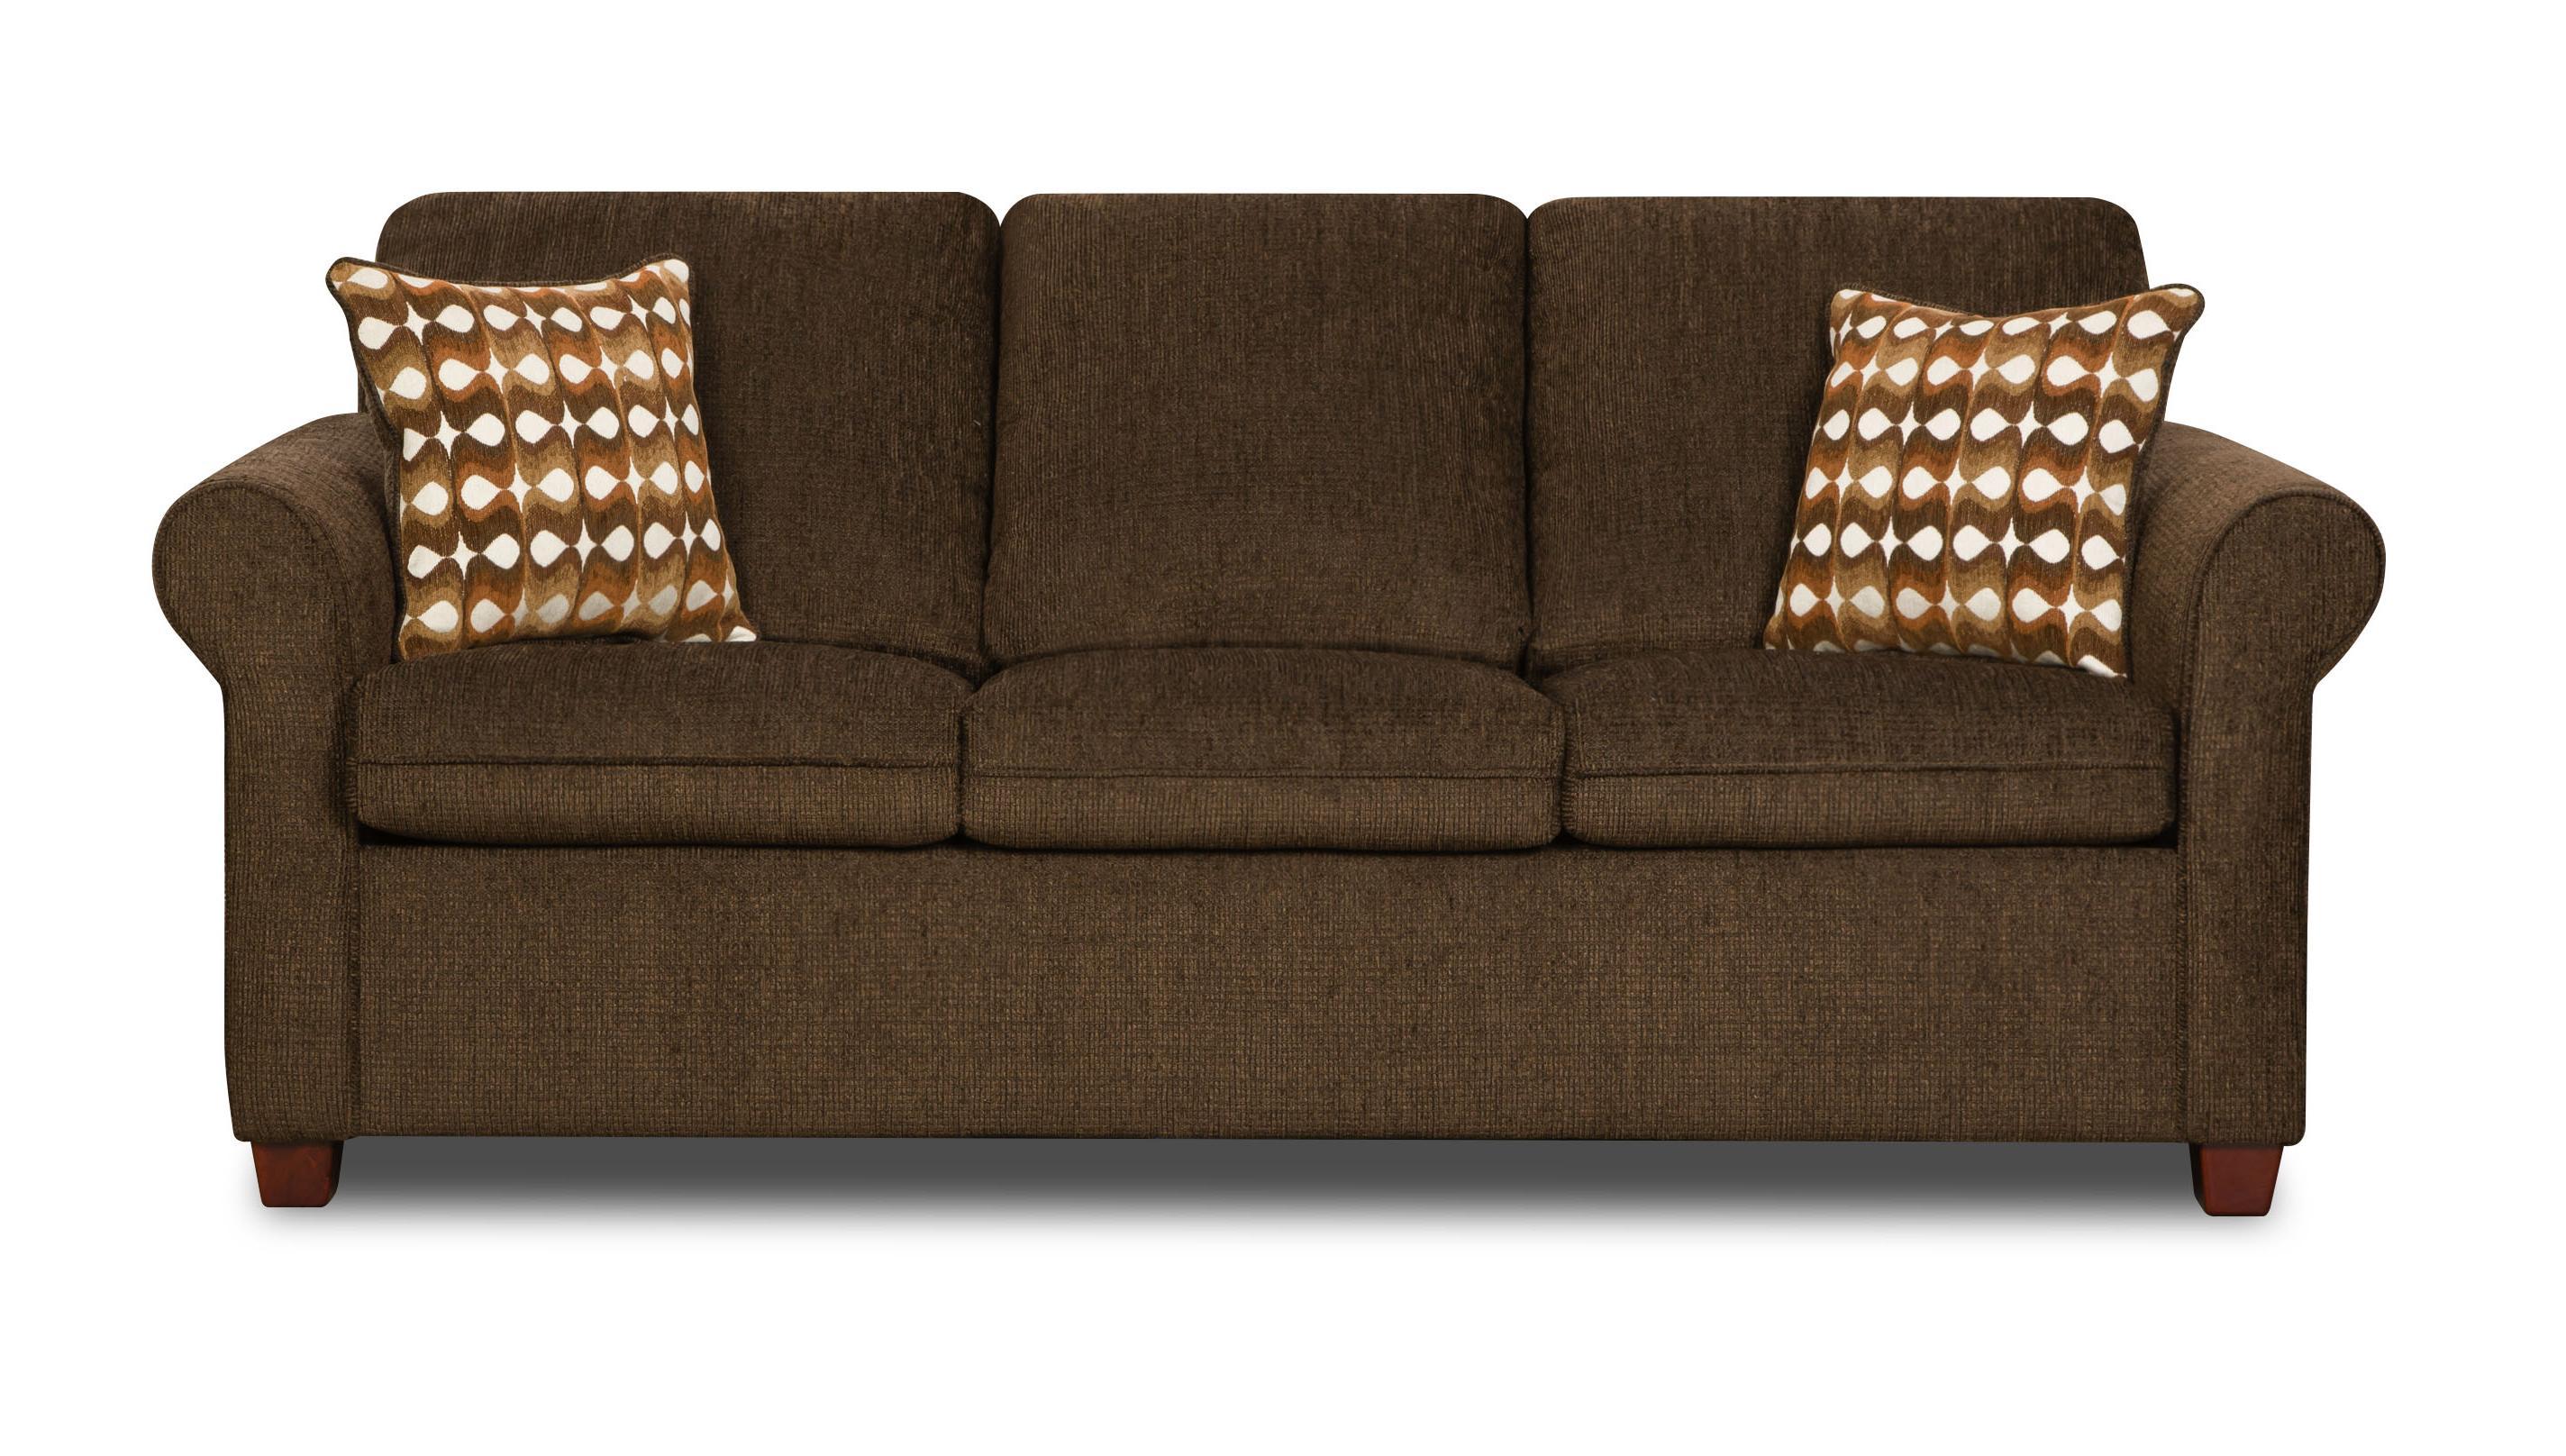 United Furniture Industries 1630 Transitional Sofa - Item Number: 1630Sofa-Nutmeg